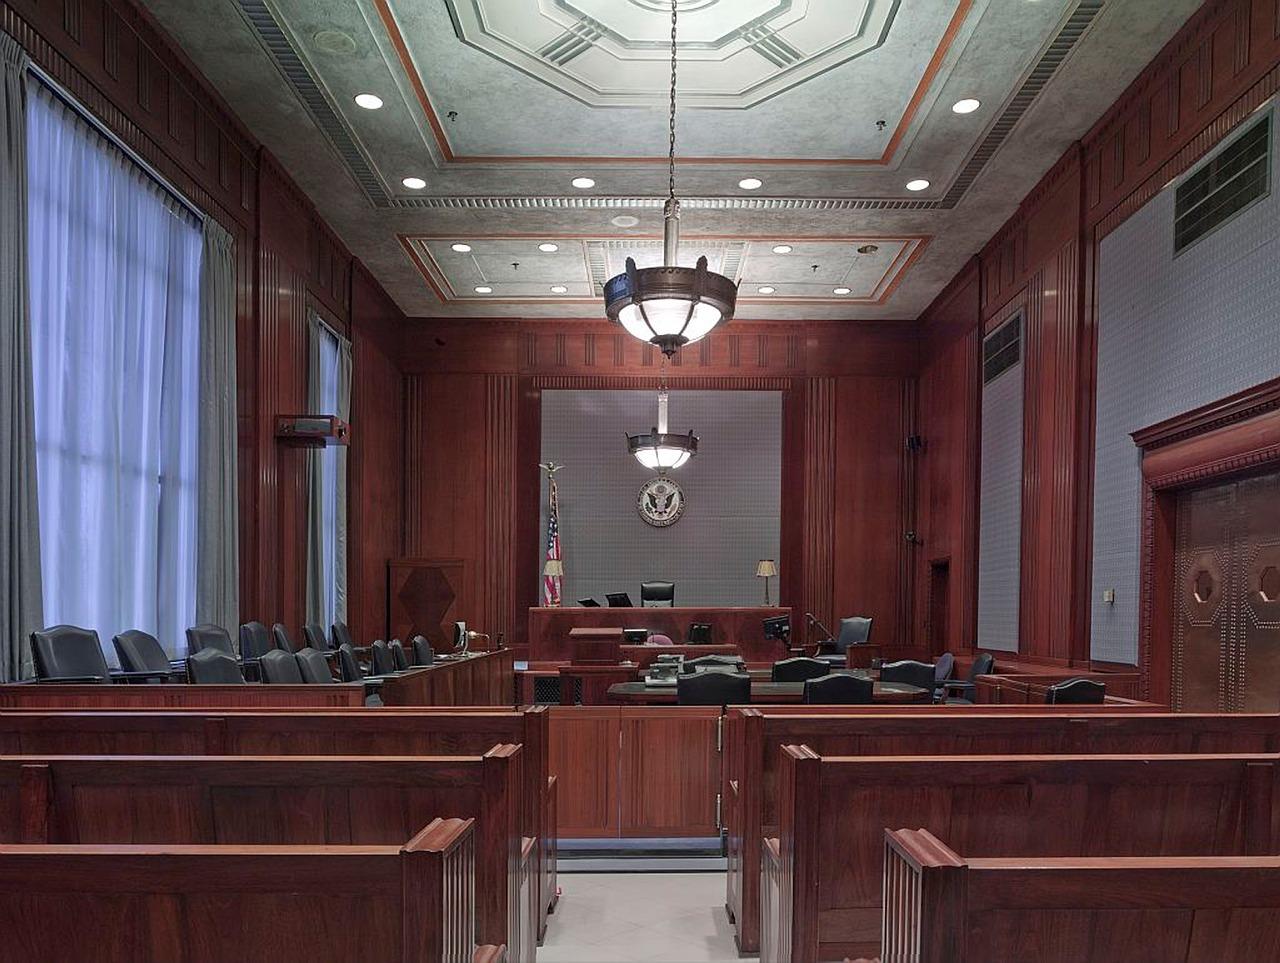 California Talcum Powder Lawsuit Sixth Mesothelioma Trial Against Johnson & Johnson